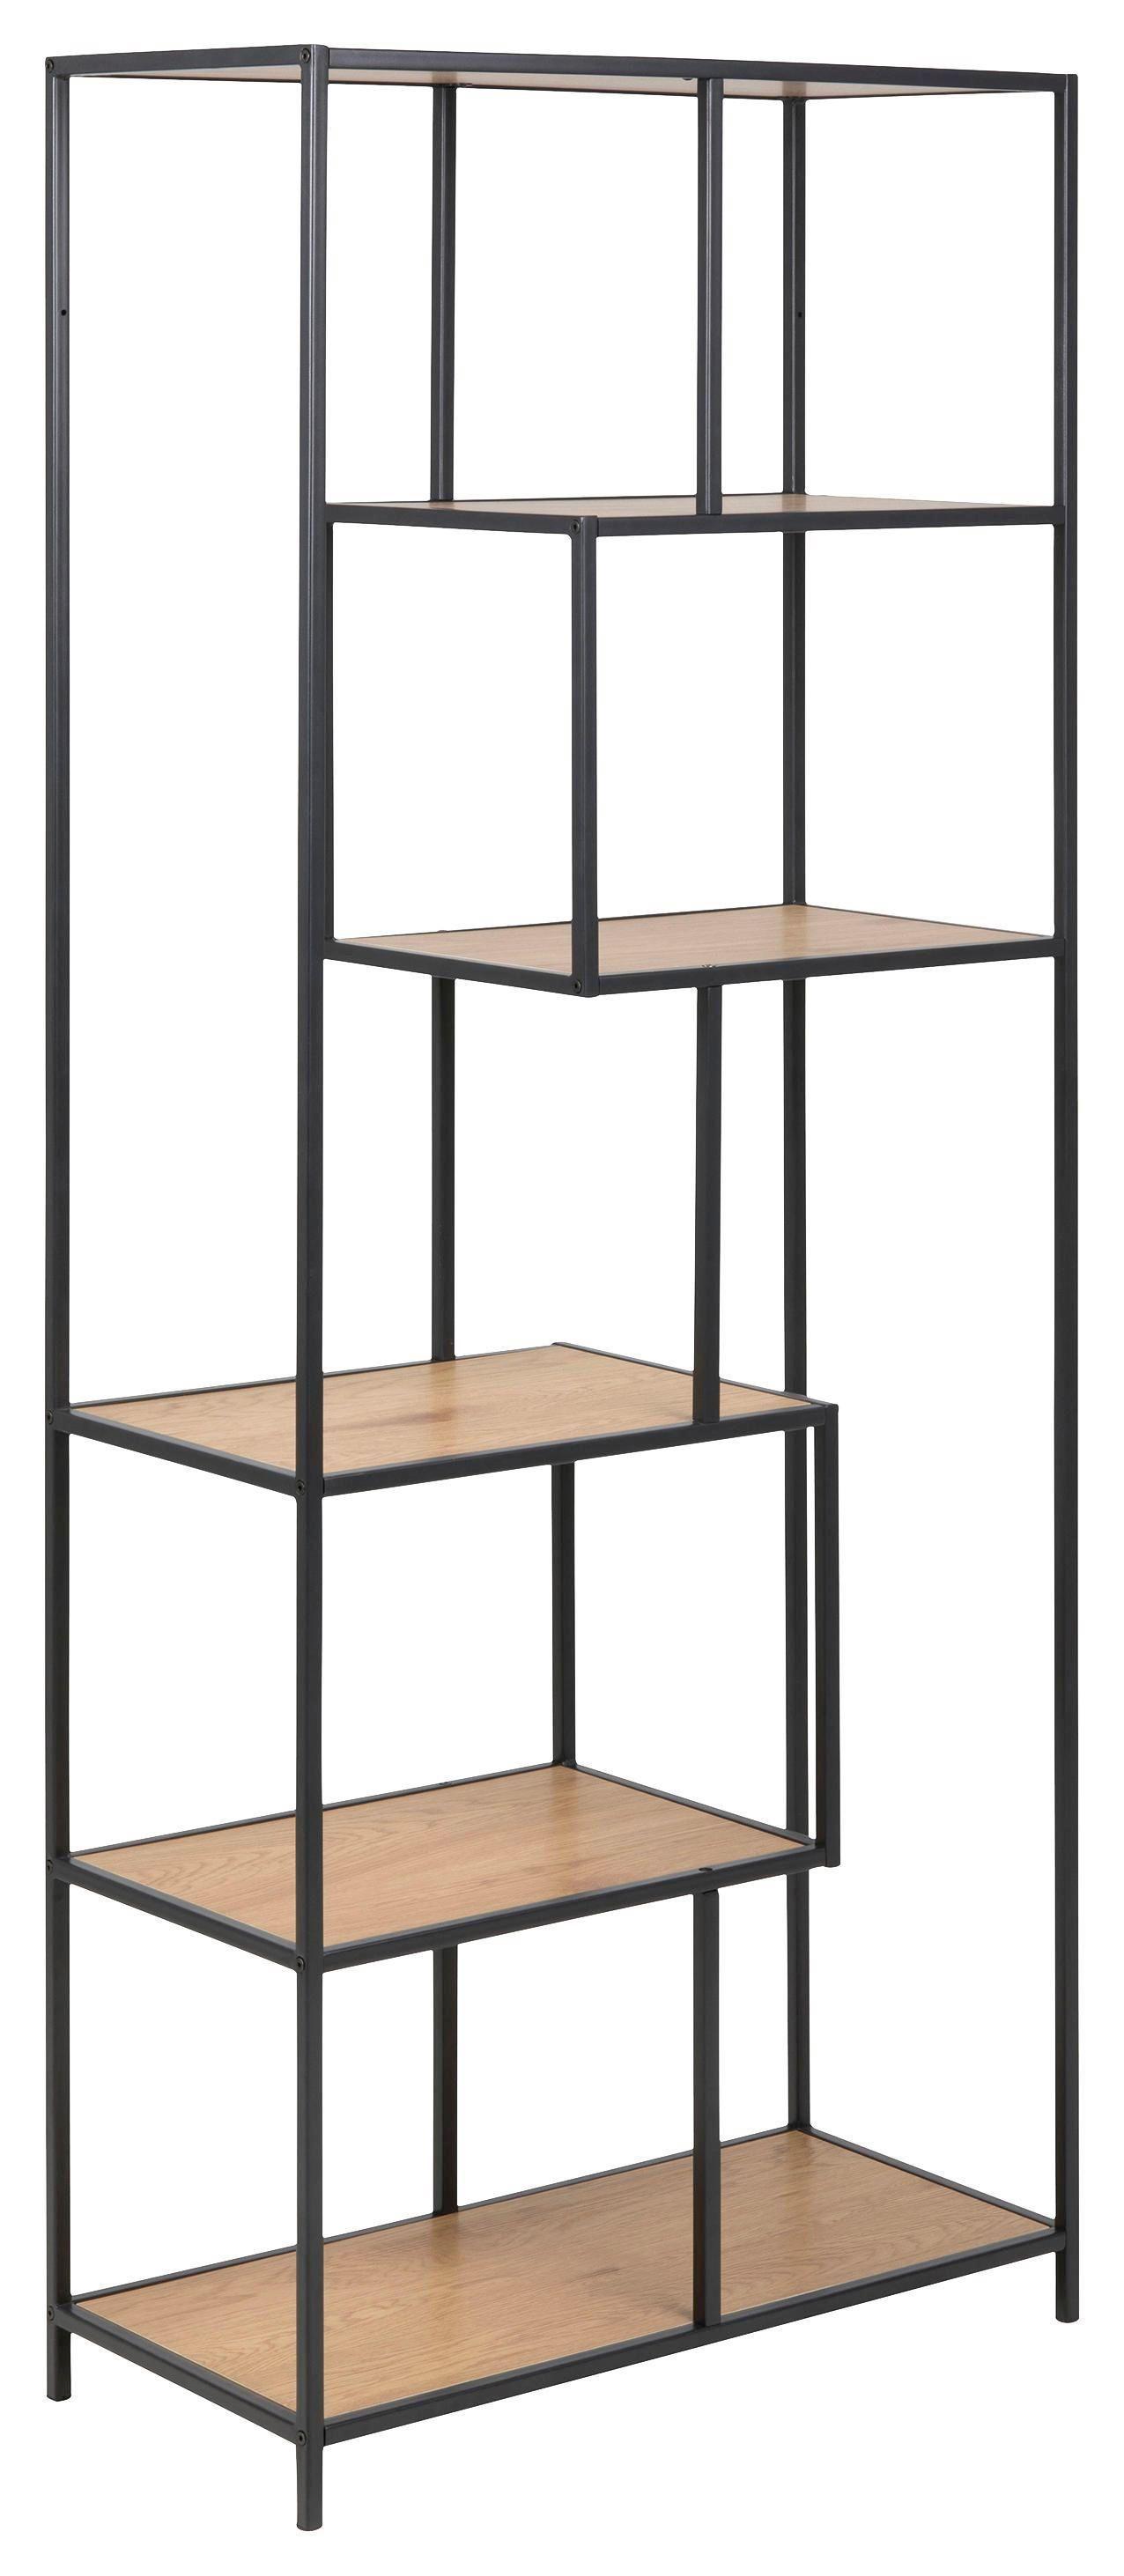 127775 128150 127775 128150 Shelf Oak Color Black Shelves Bookshelves Wallshelves Diy Regal Schwarz Regal Metall Regal